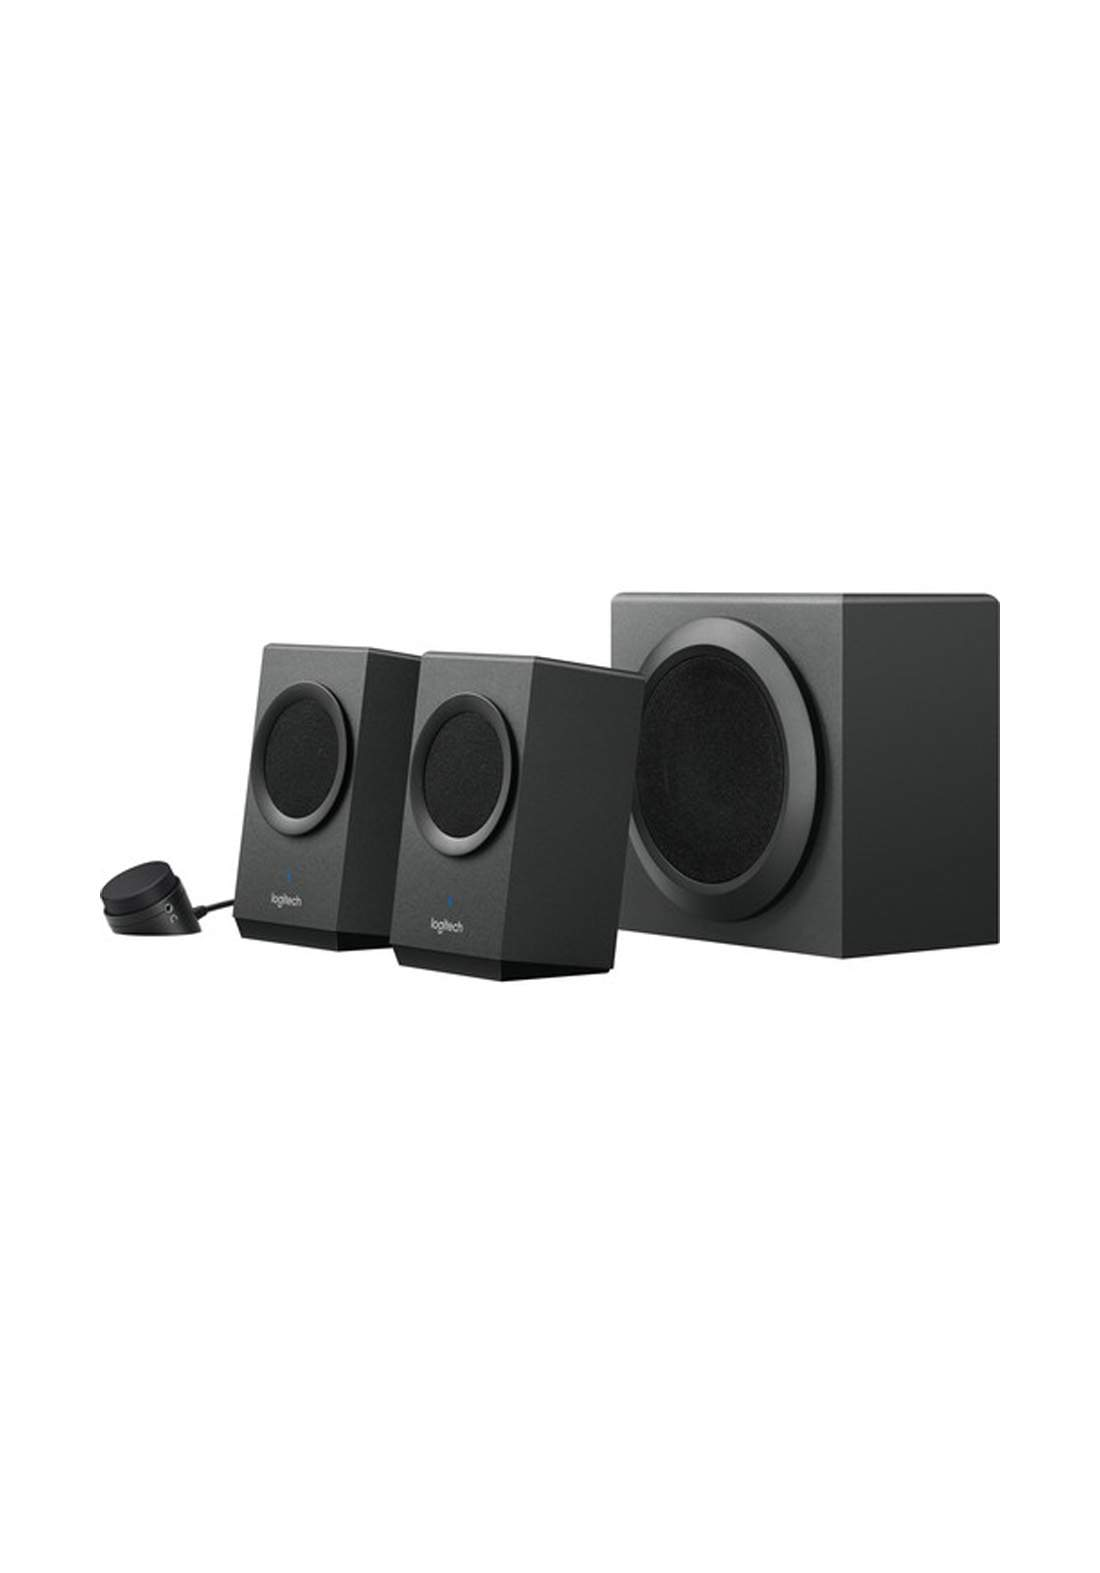 Logitech Z337 2.1 Bluetooth Computer Speaker System with Subwoofer - Black  مكبر صوت